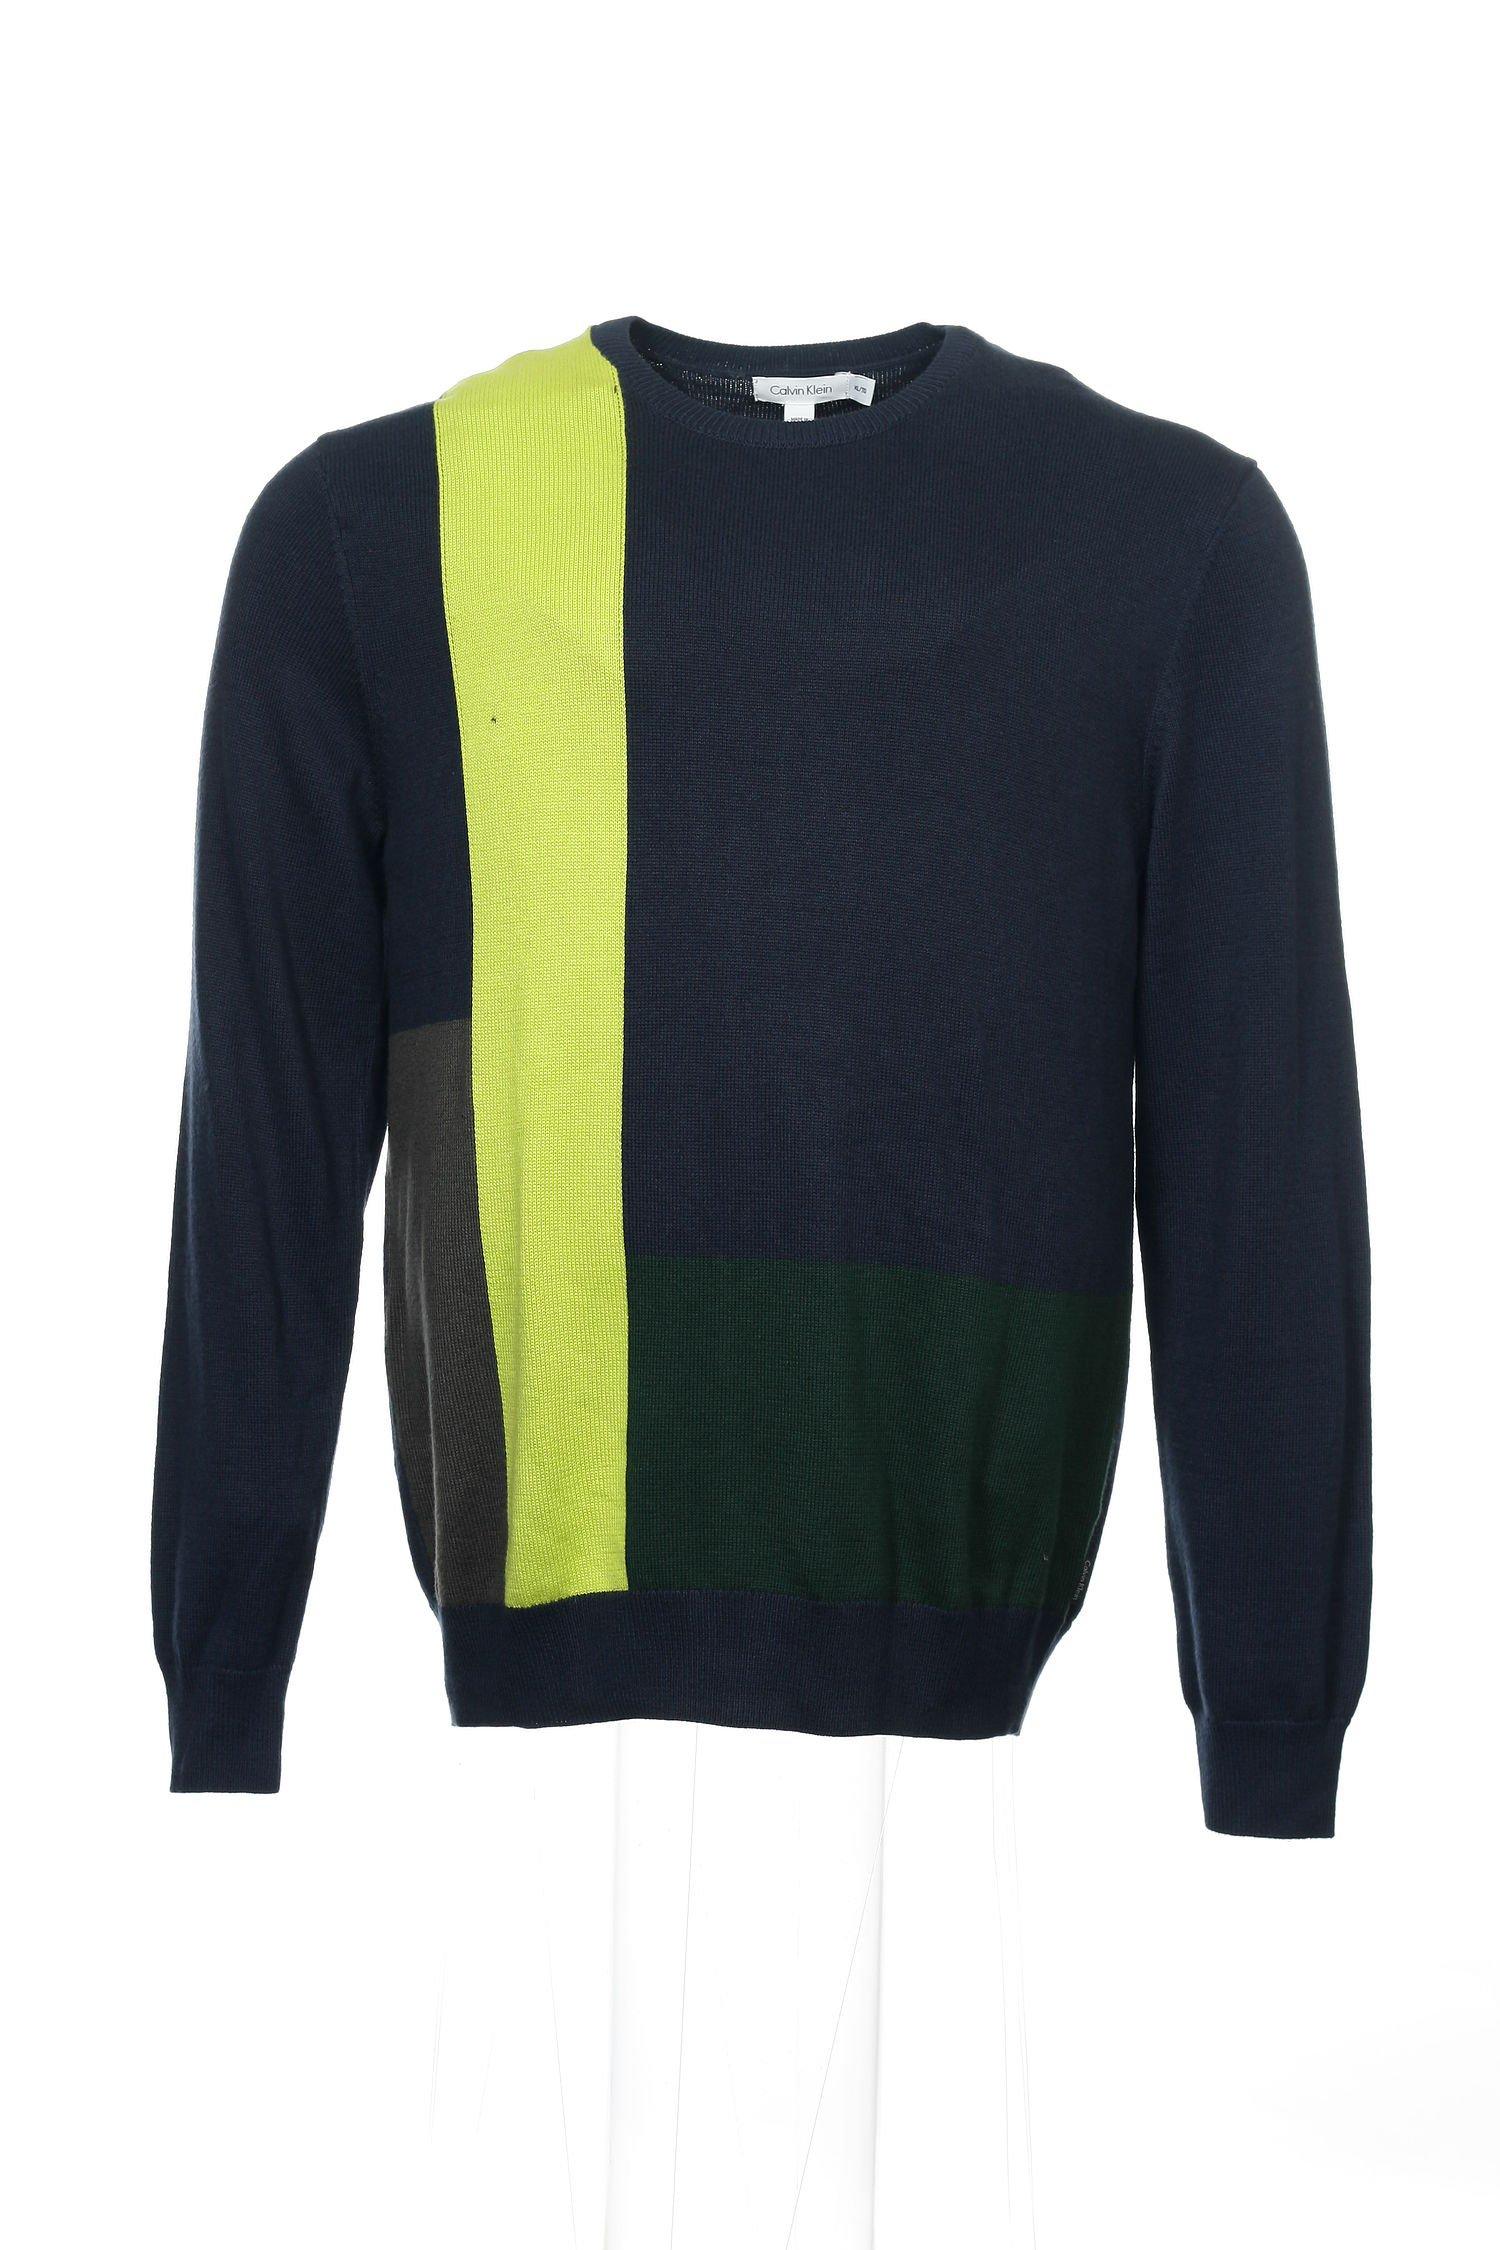 Calvin Klein Men's Color Blocked Sweater, Cadet Blue, Large